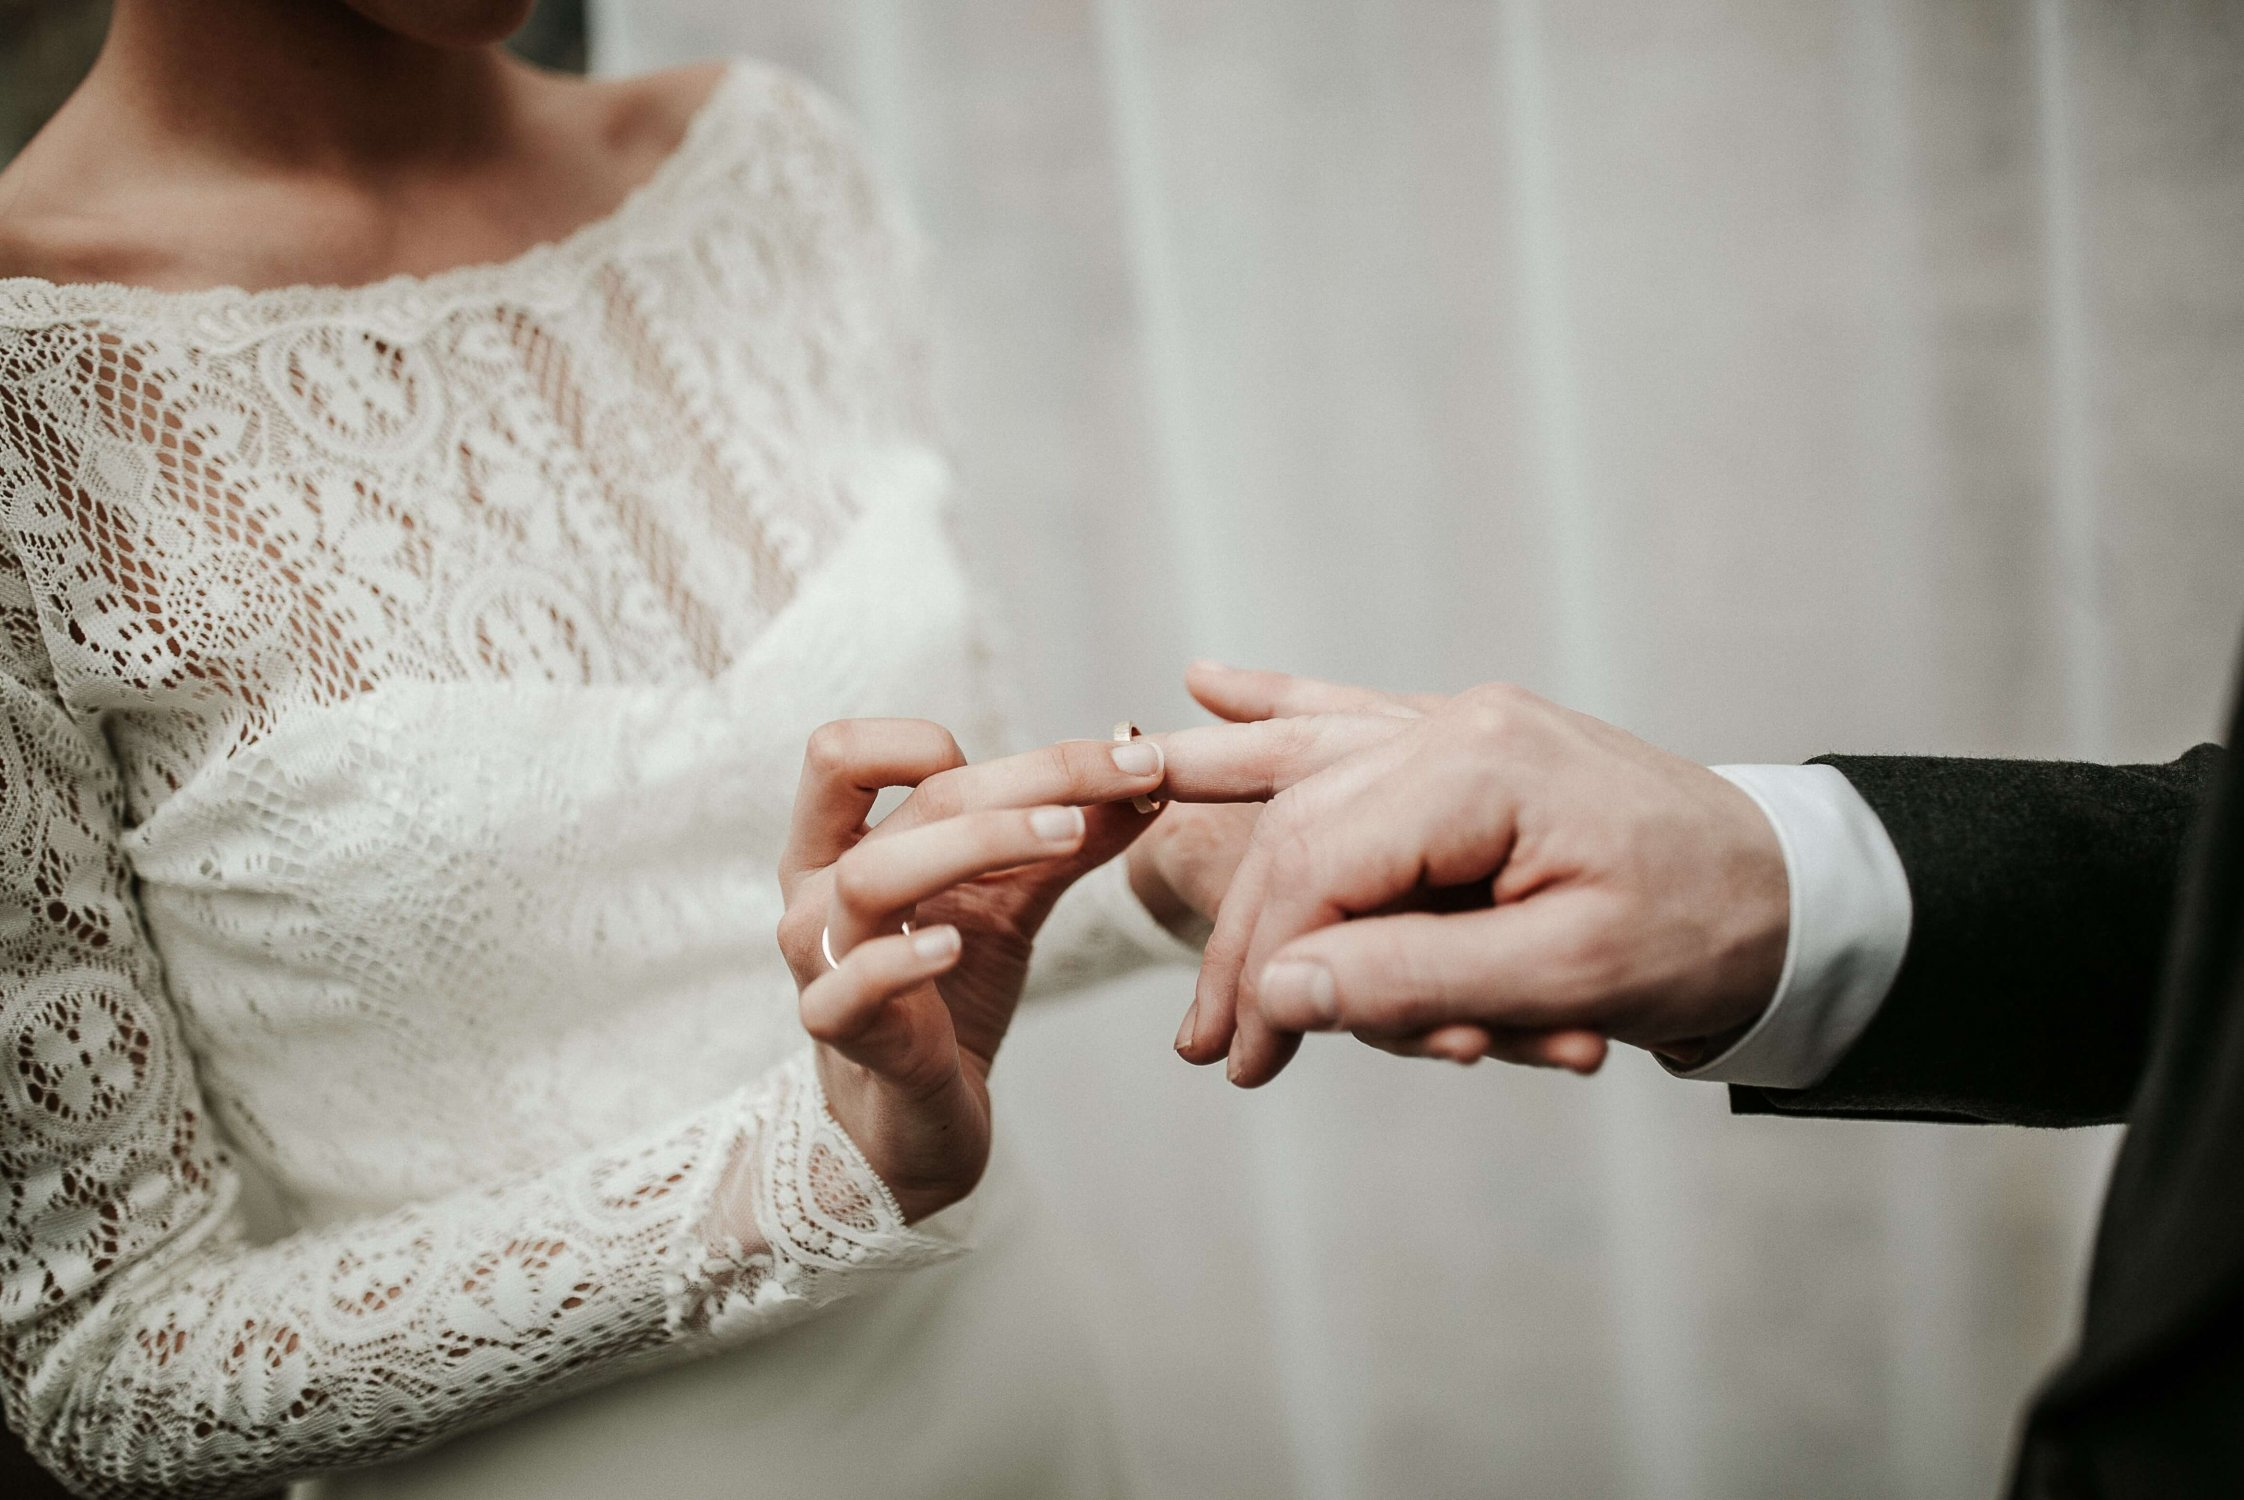 Minimalistische bruiloft minimal wedding trouwringen uitwisselen. Styling www.tablemoments.nl